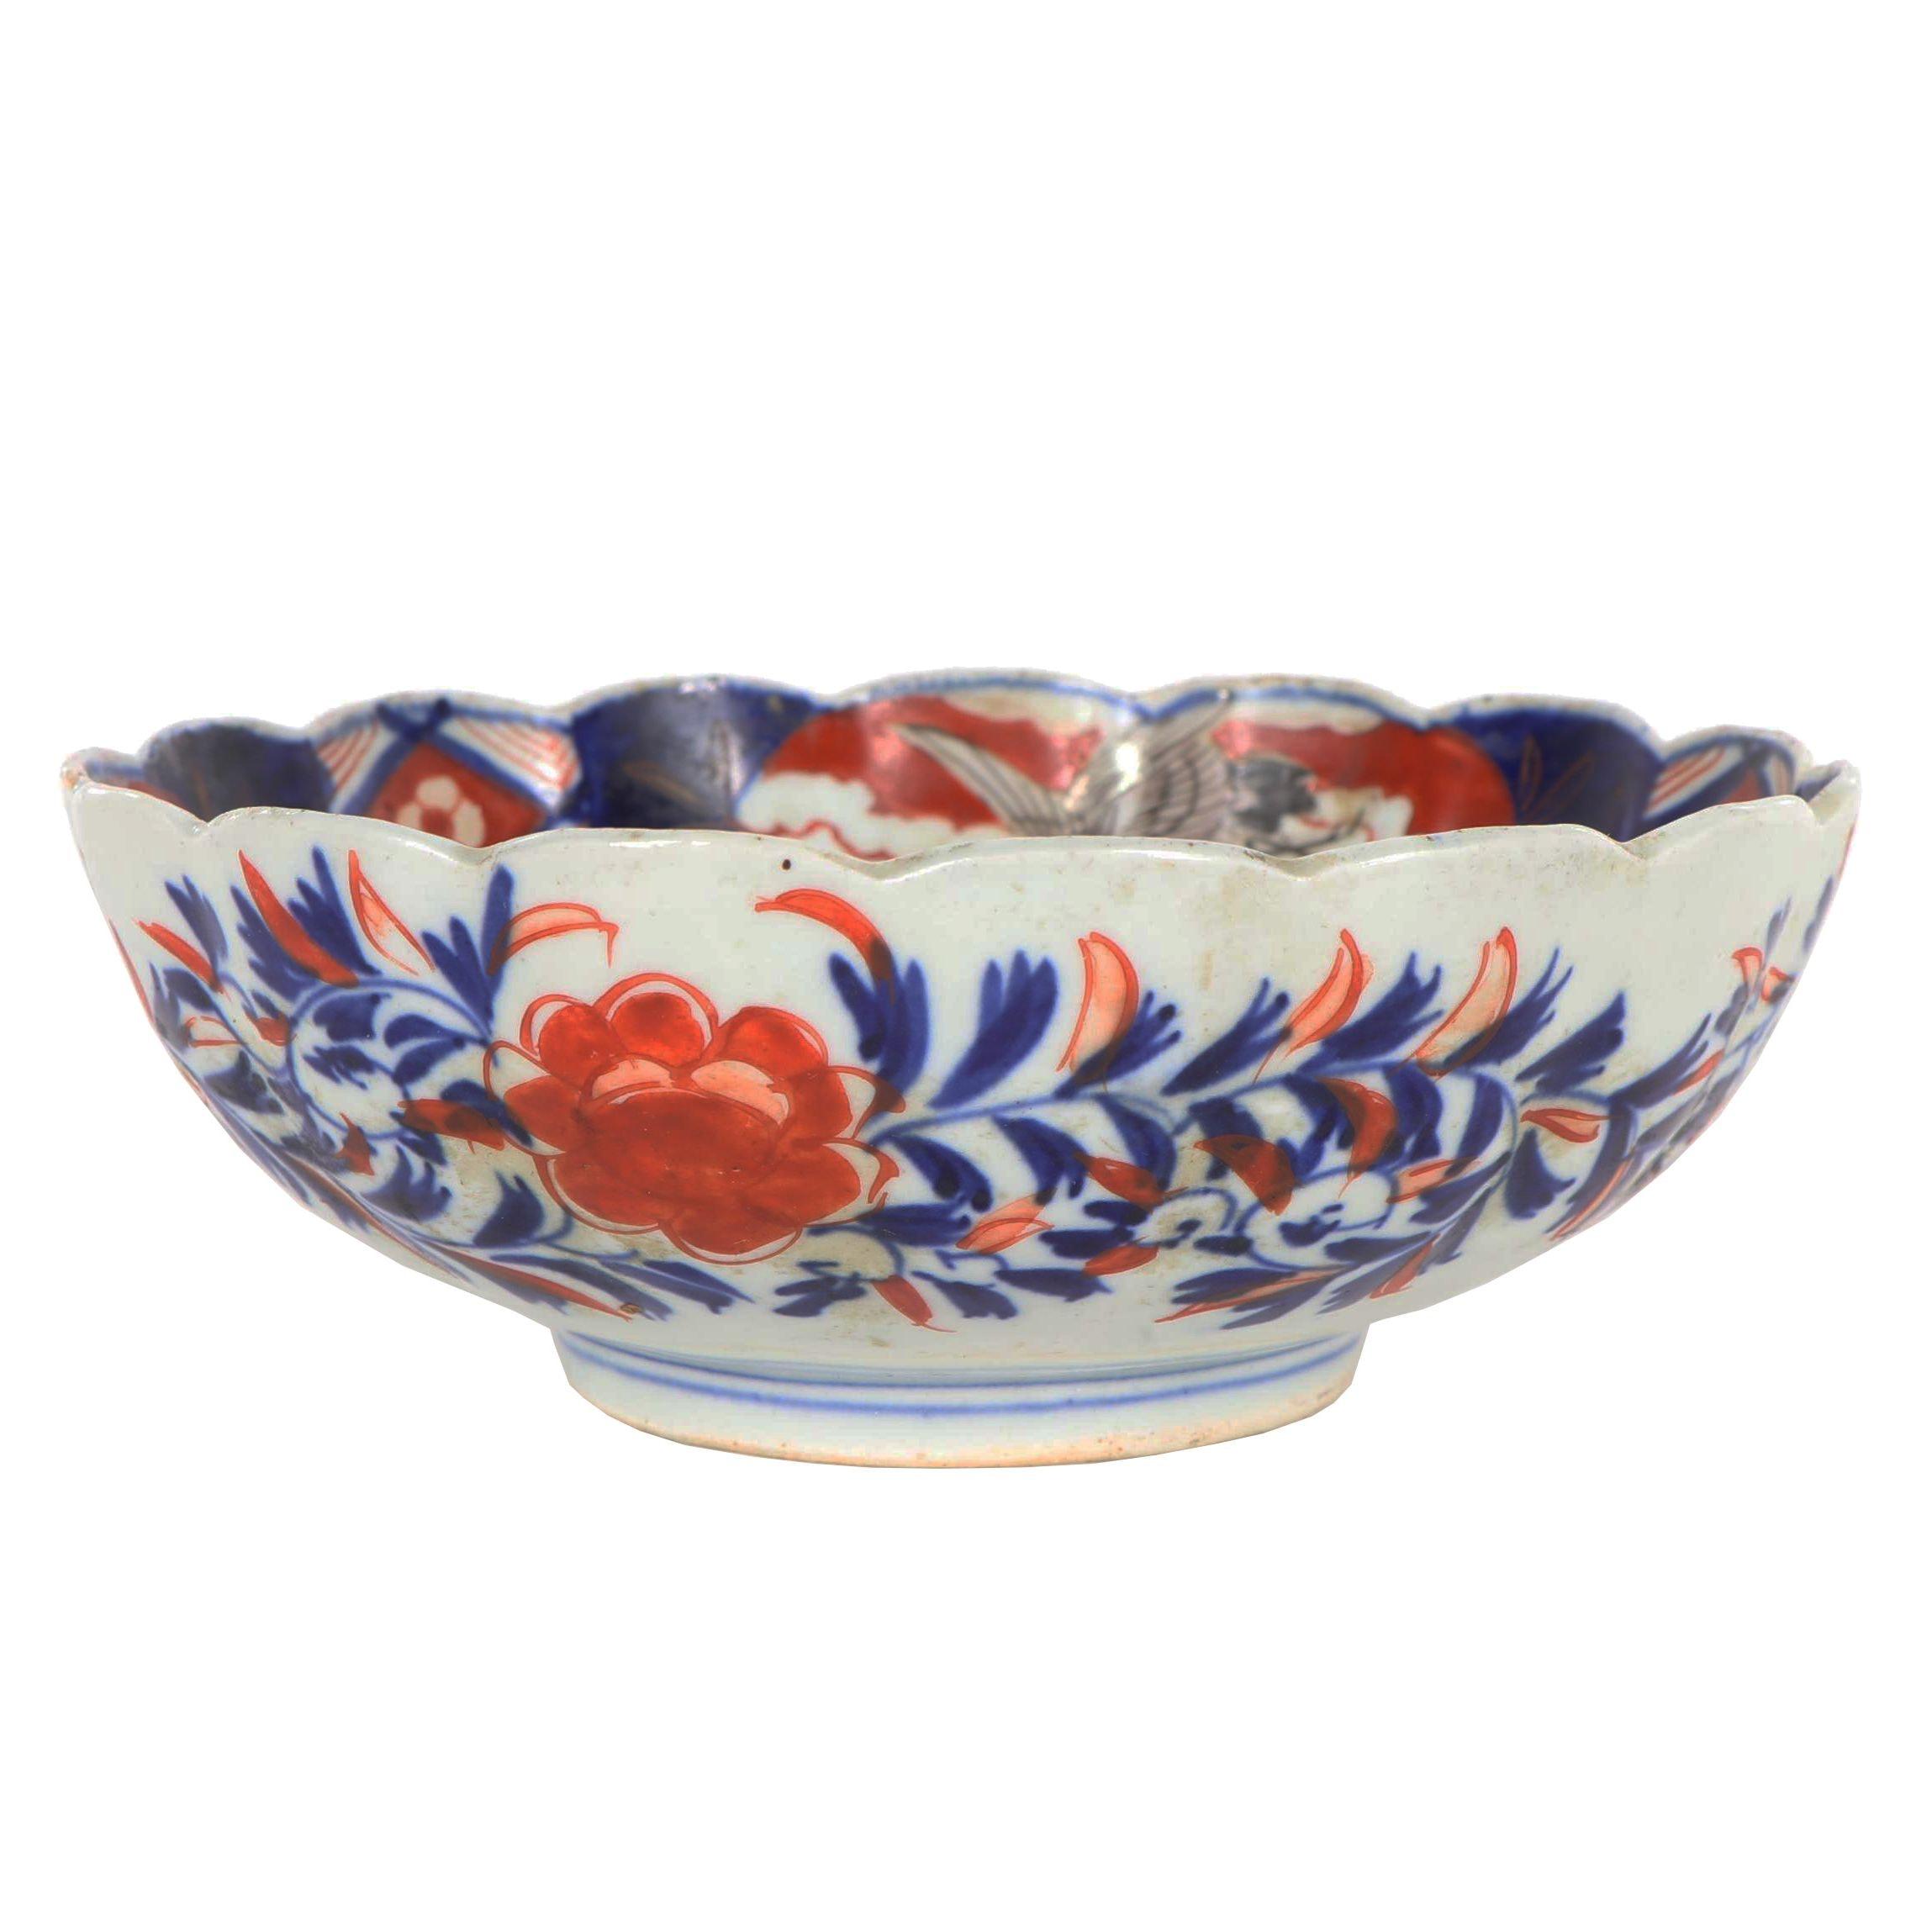 Japanese Imari Hand-Decorated Porcelain Bowl